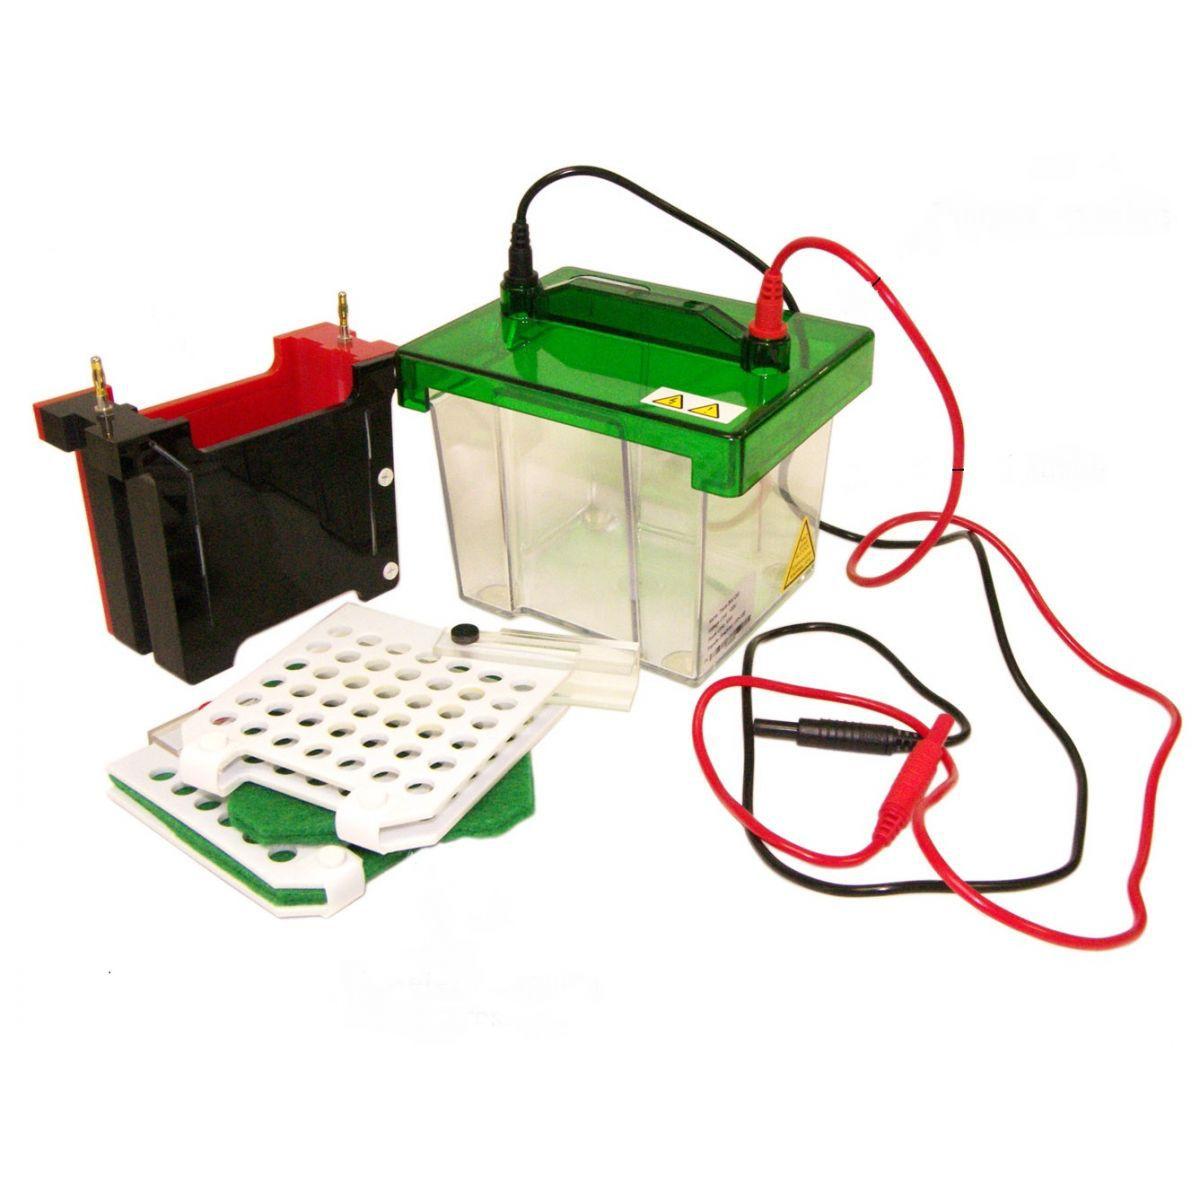 Eletroblotter 10cm x 10cm - Para 2 transferências (Sistema para Eletroblotting) - Modelo: DG-BLOT